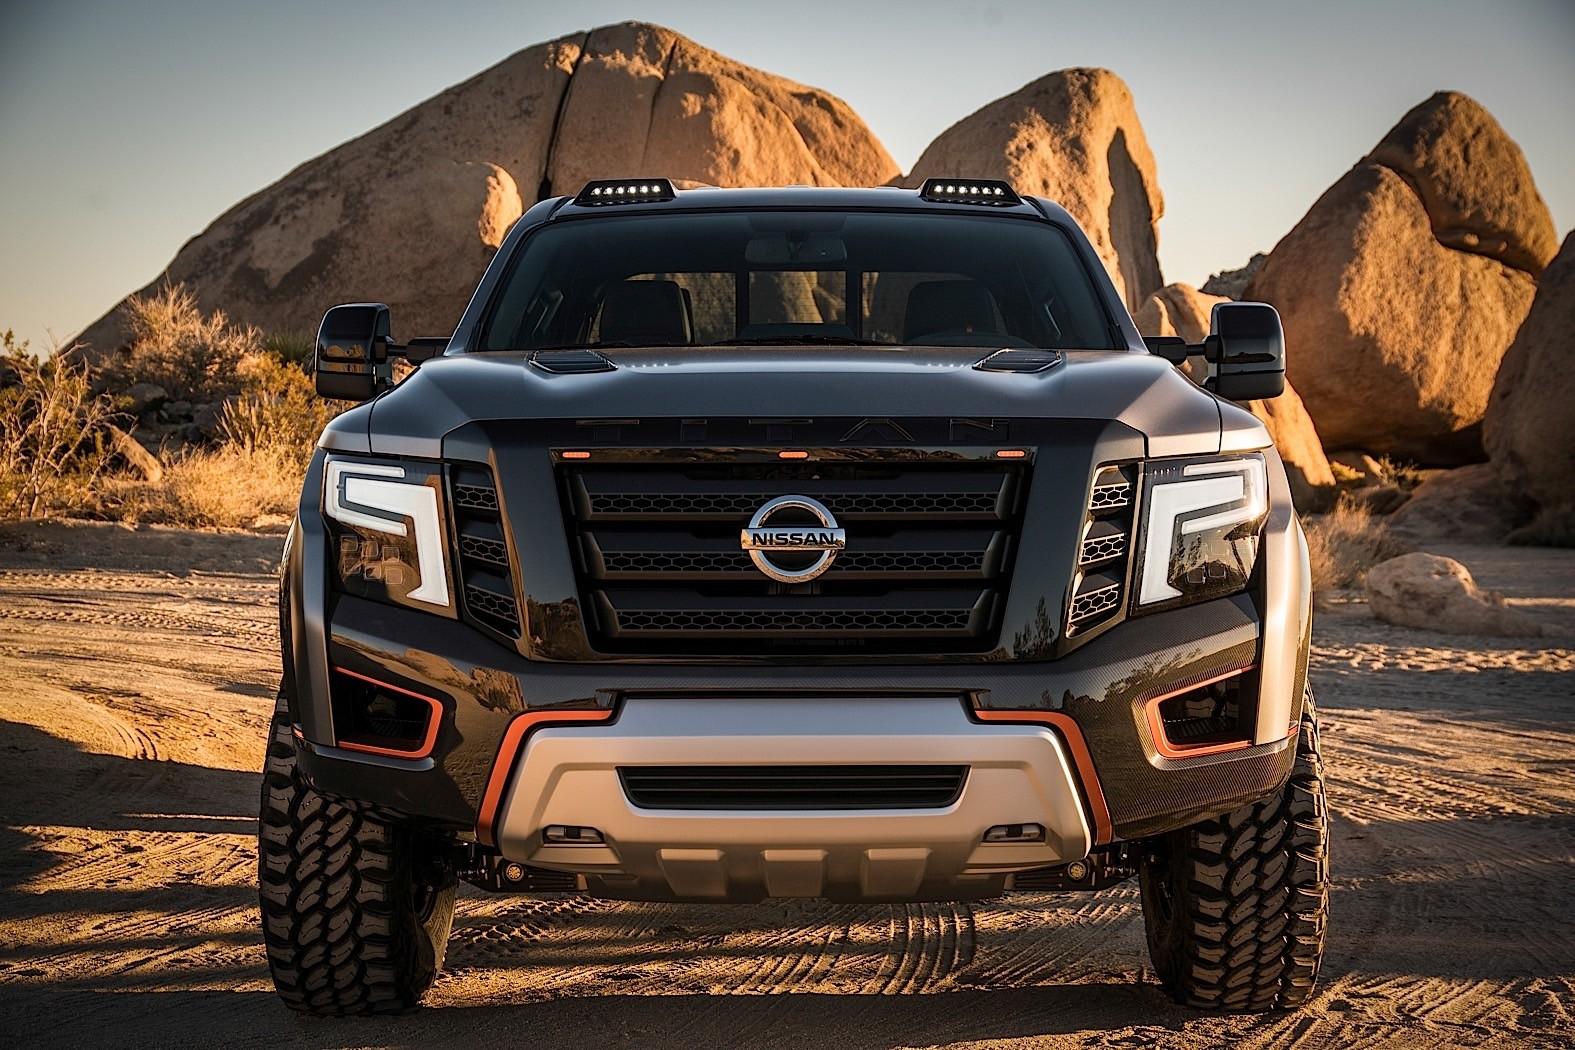 New Nissan Titan >> Nissan Titan Warrior Concept Unleashed at Detroit Auto Show - autoevolution